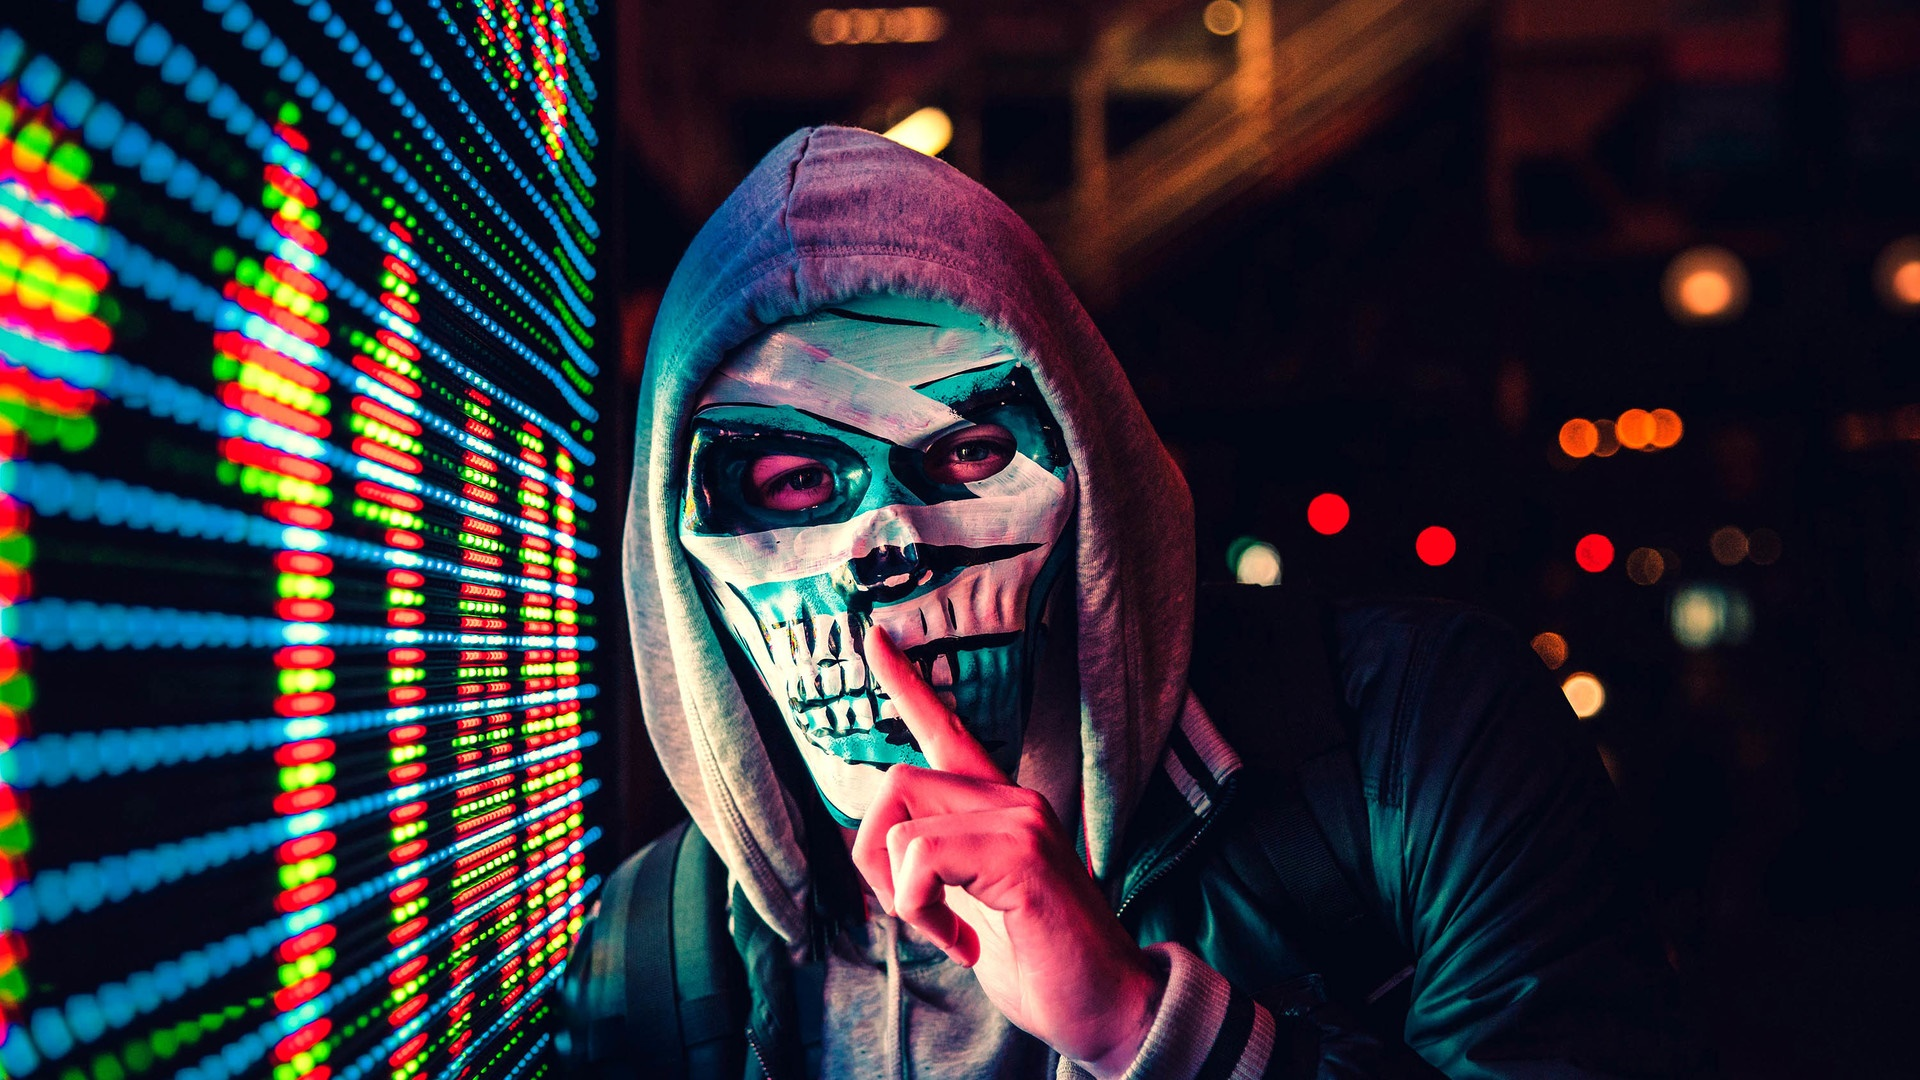 skullfull mask boy wallpaper